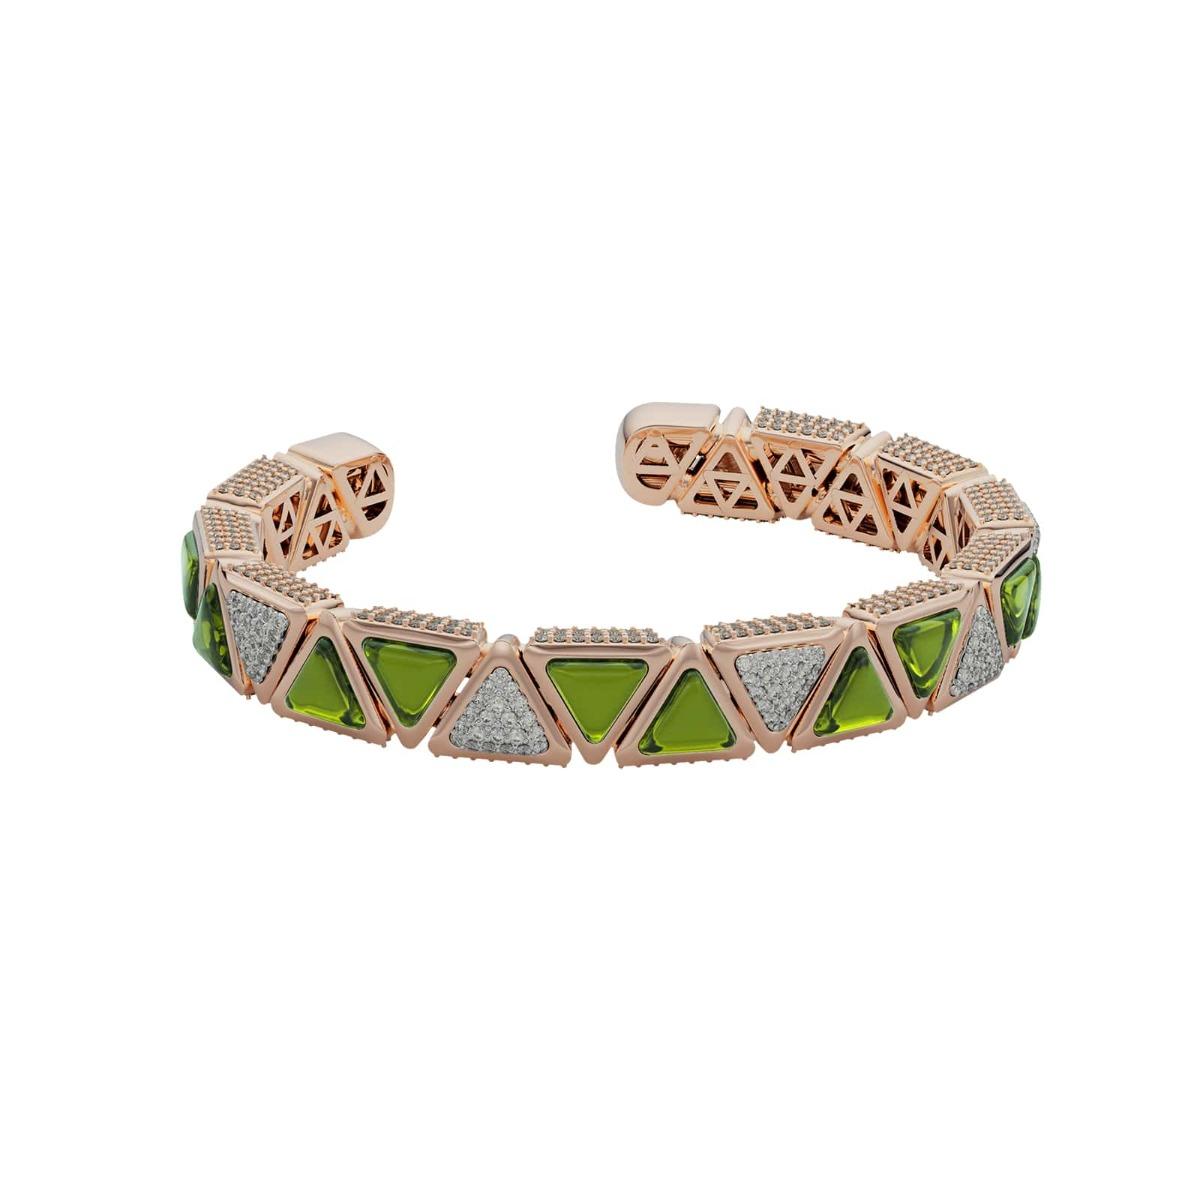 Diamond and Tourmaline Triangle Bangle Bracelet - Mirror Collection